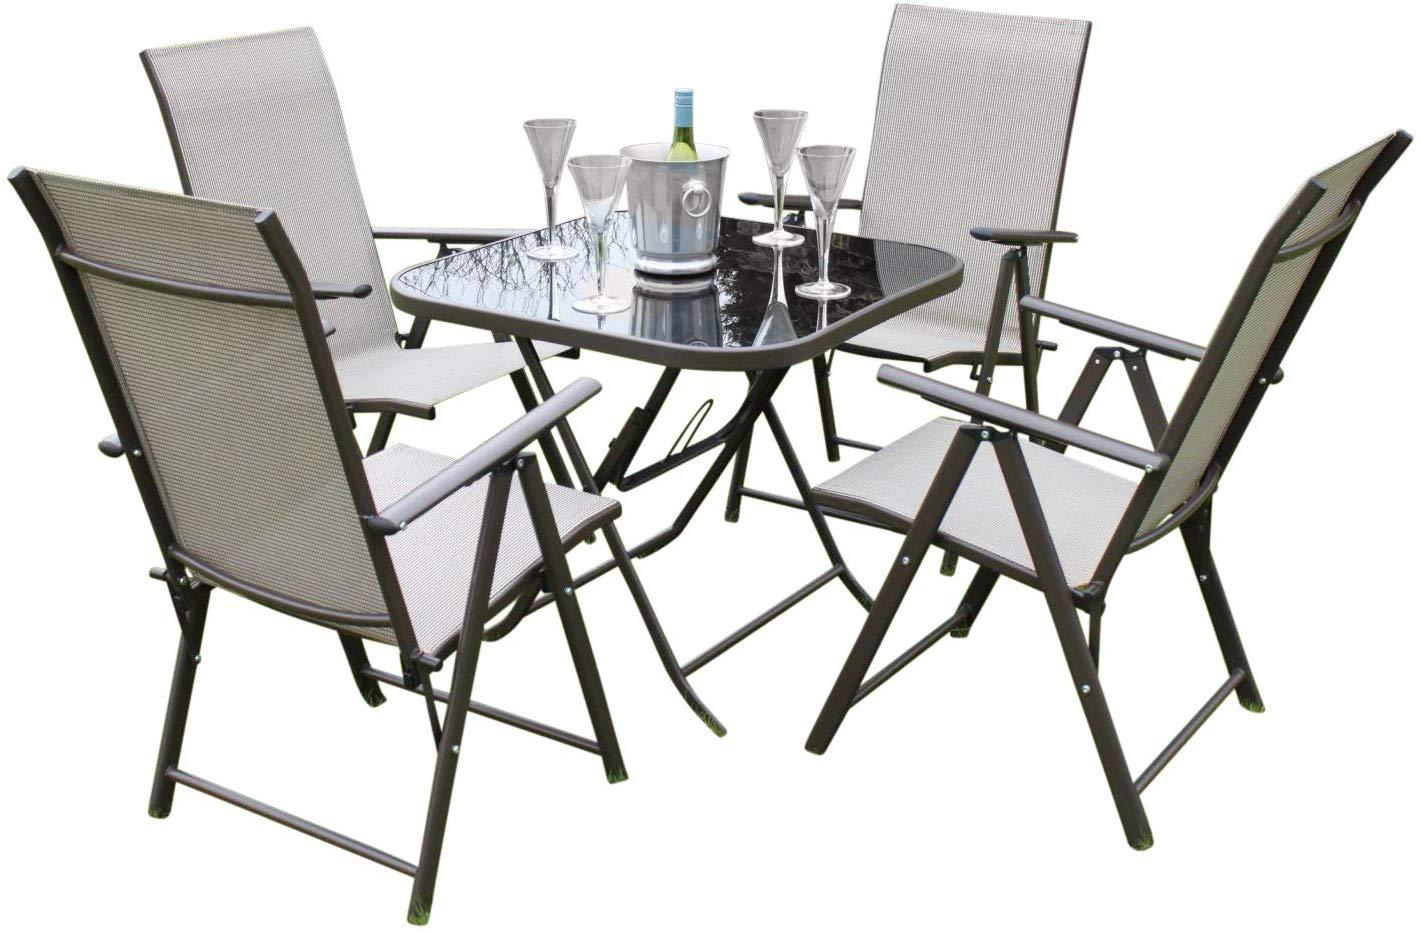 henley 4 seater garden dining set wr1254 wr1652